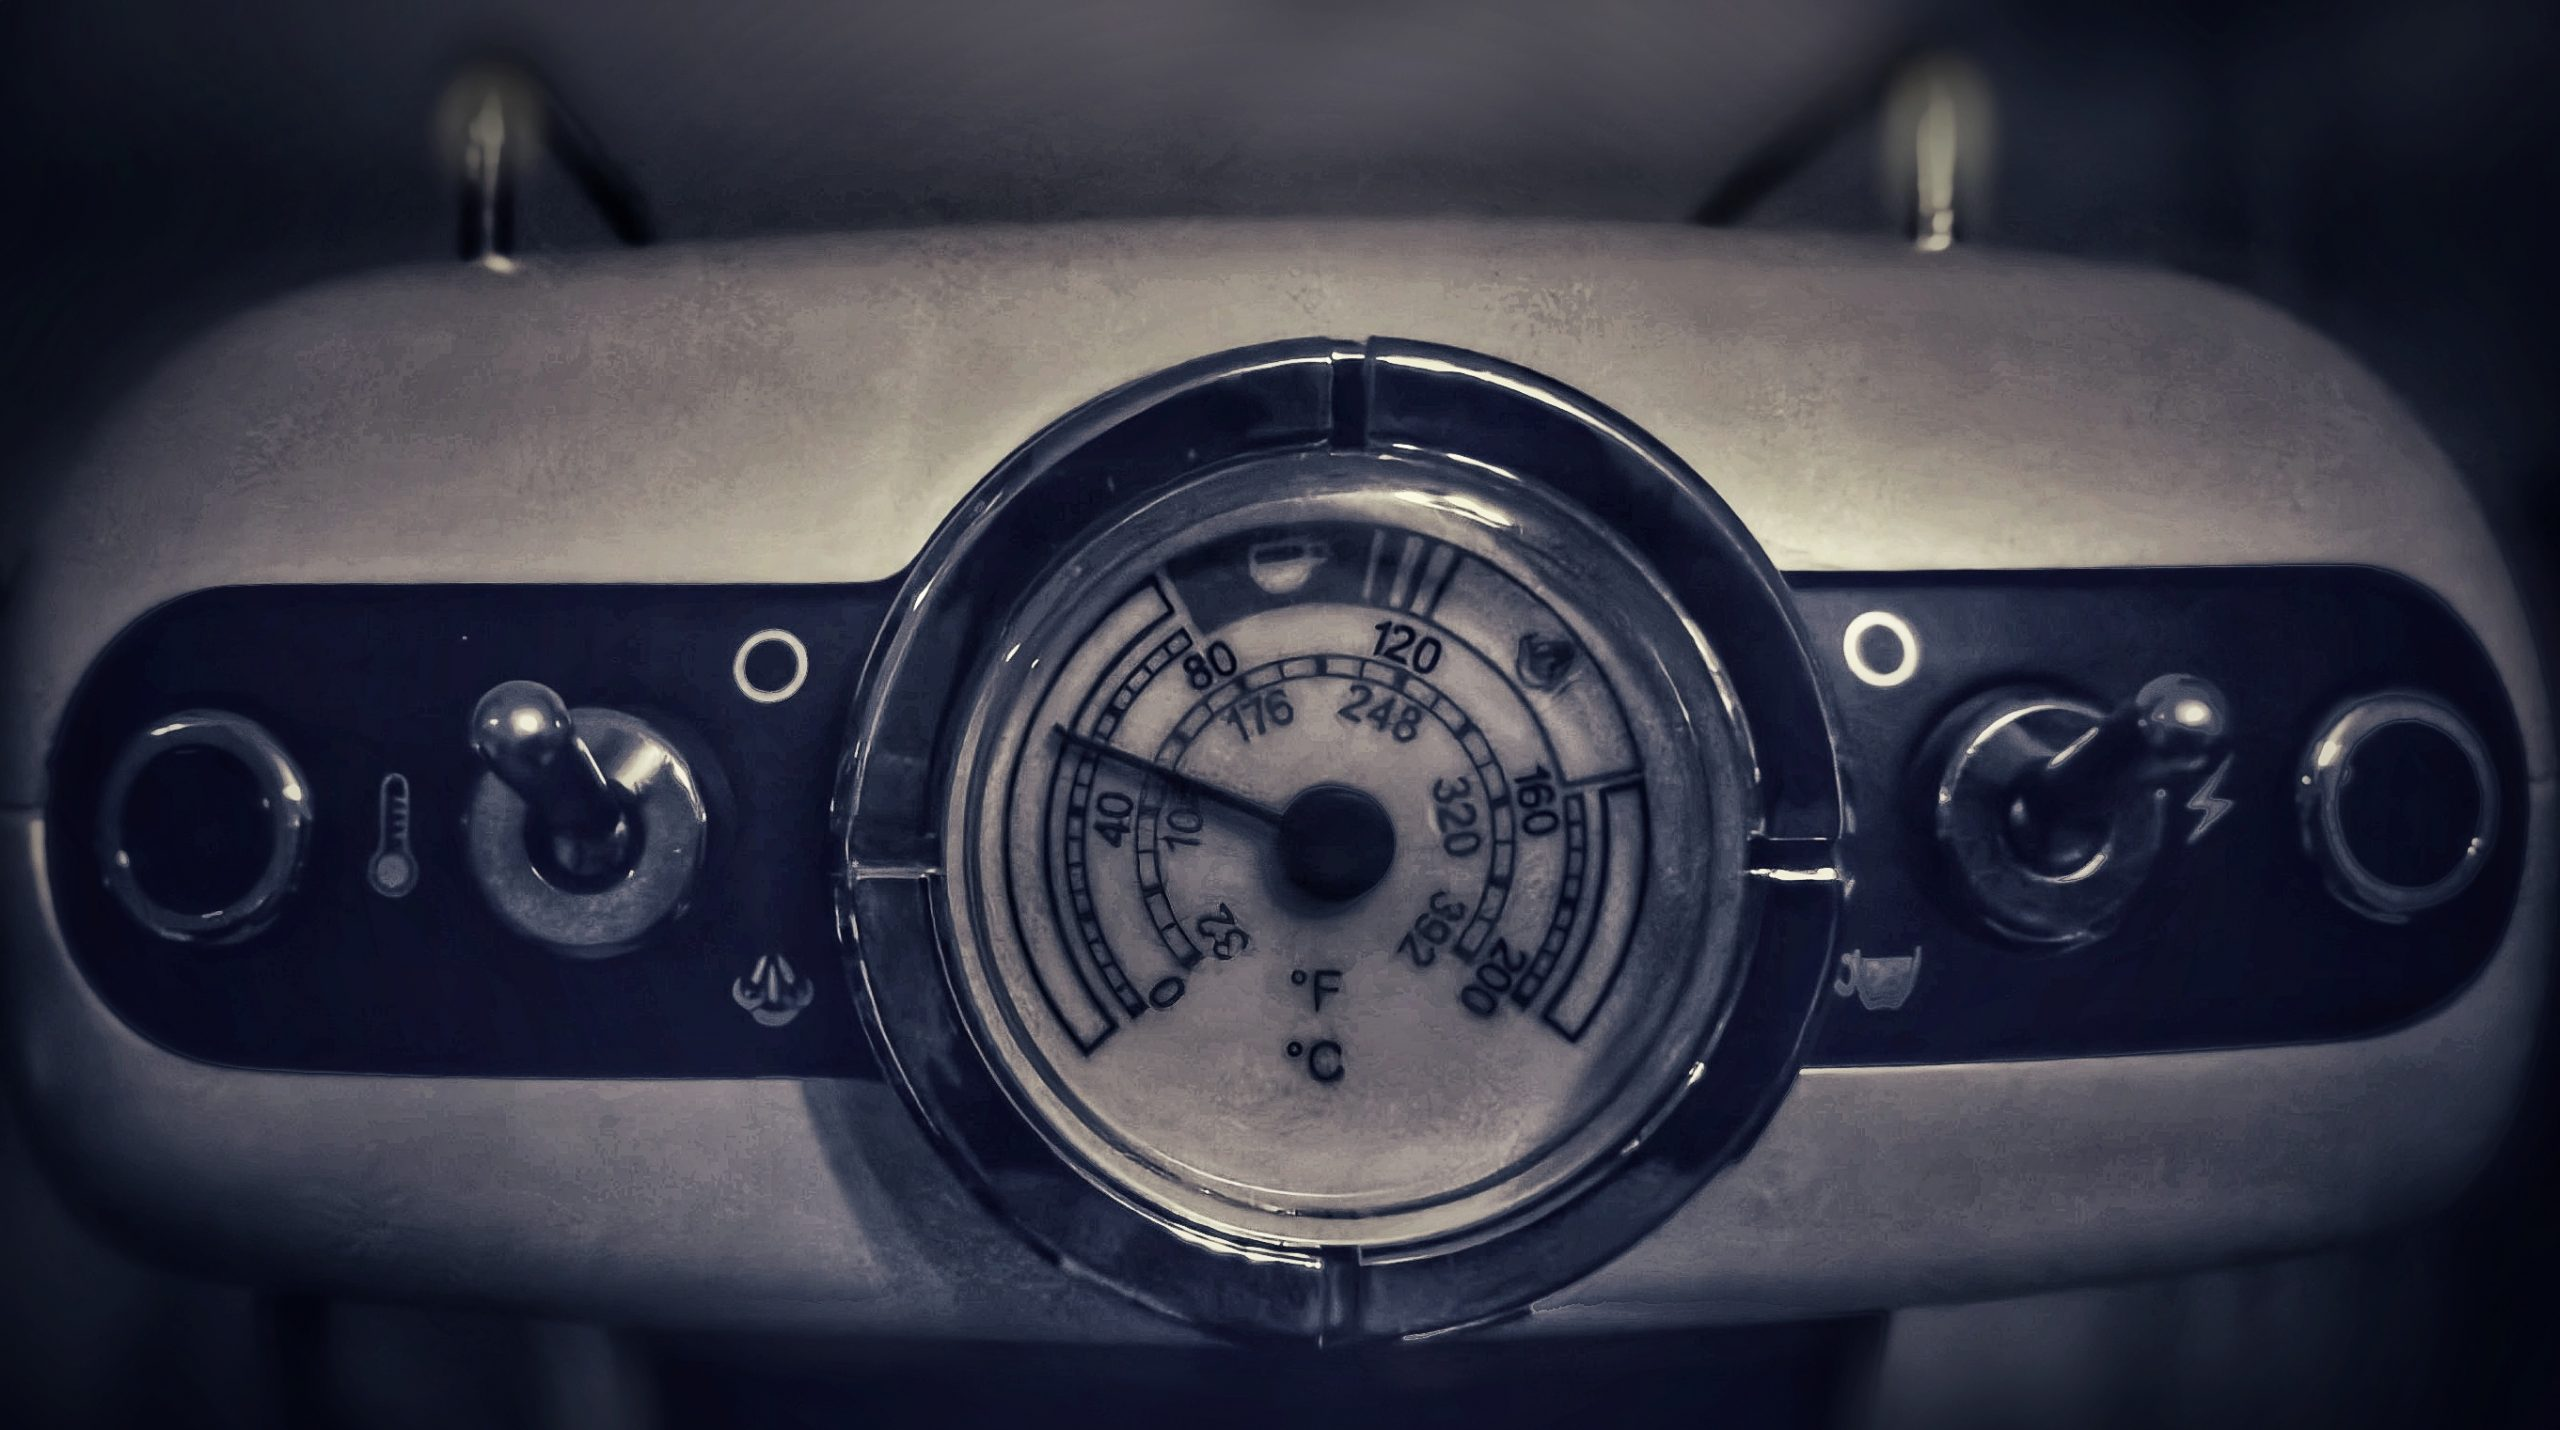 Espresso machine's analog meter